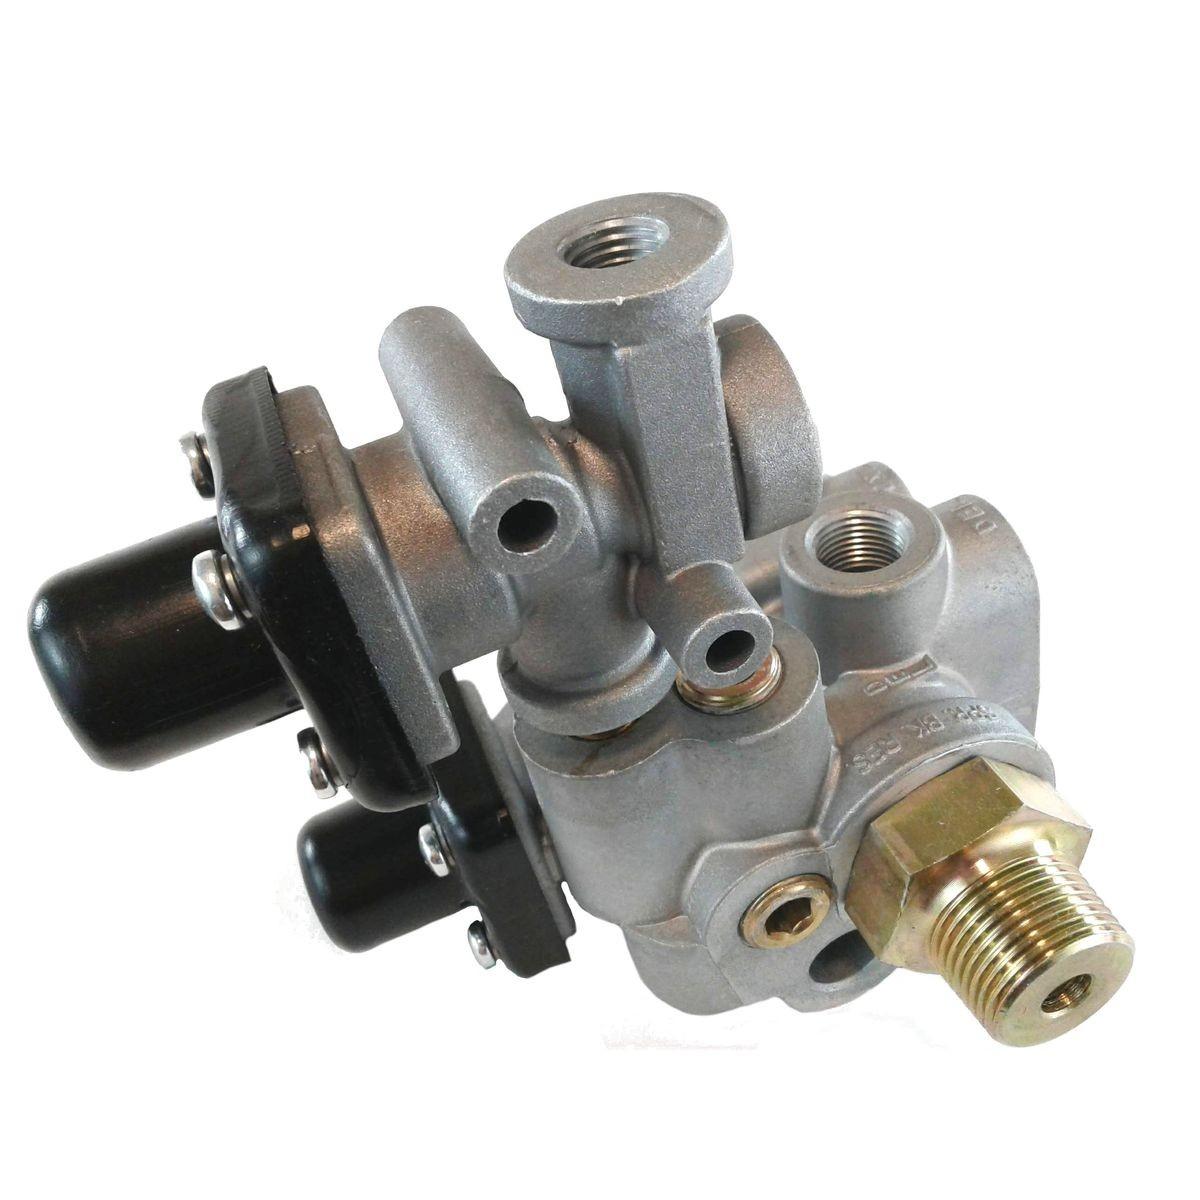 U.s. Auto Parts Air Brake System Sr 4 Trailer Spring Air Brake Parking Emergency System Valve 3 4 Of U.s. Auto Parts Air Brake System